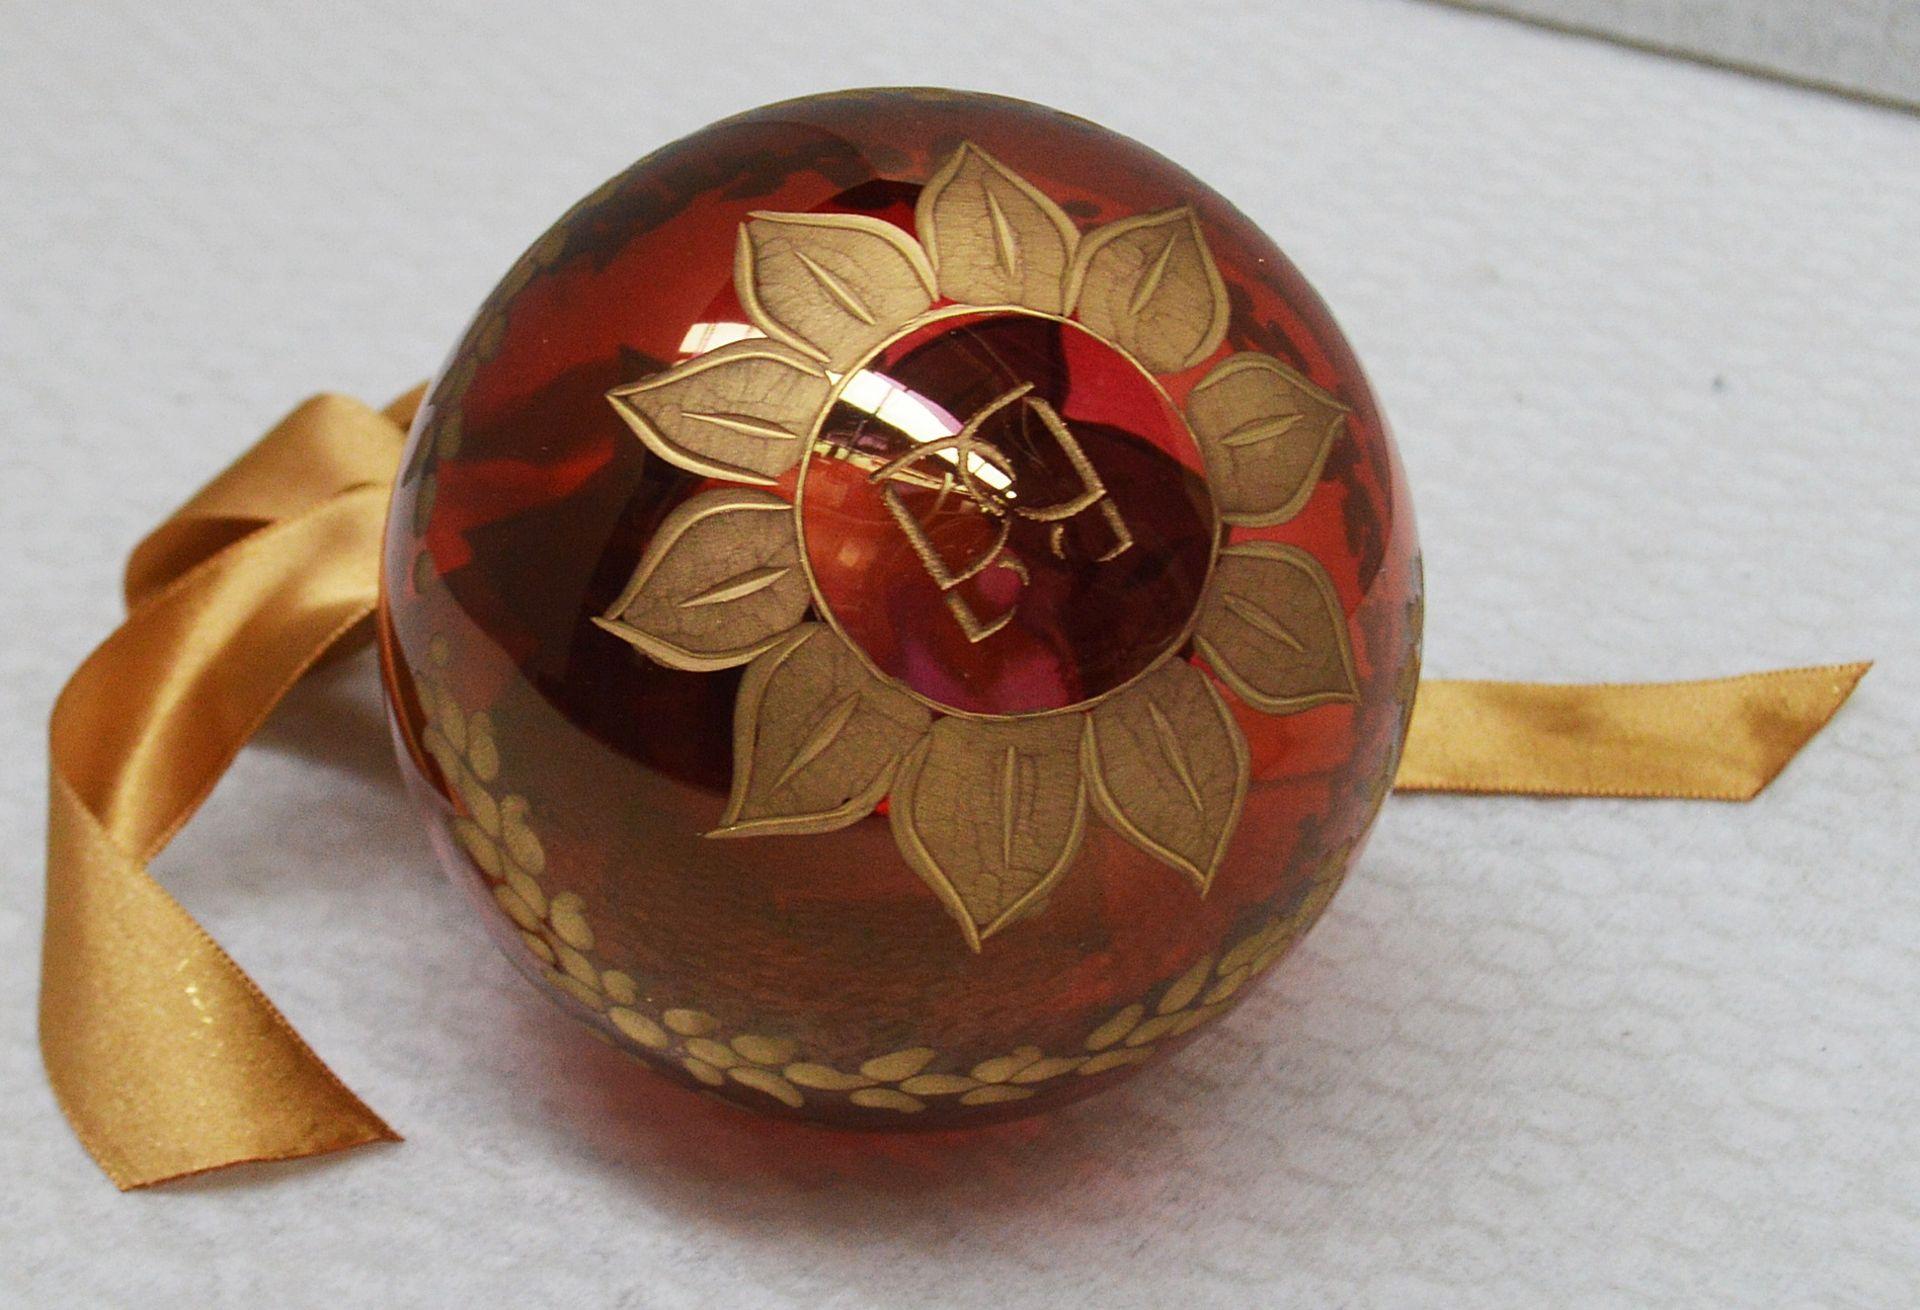 1 x BALDI 'Home Jewels' Italian Hand-crafted Artisan Christmas Tree Decoration - RRP £114.00 - Image 2 of 5